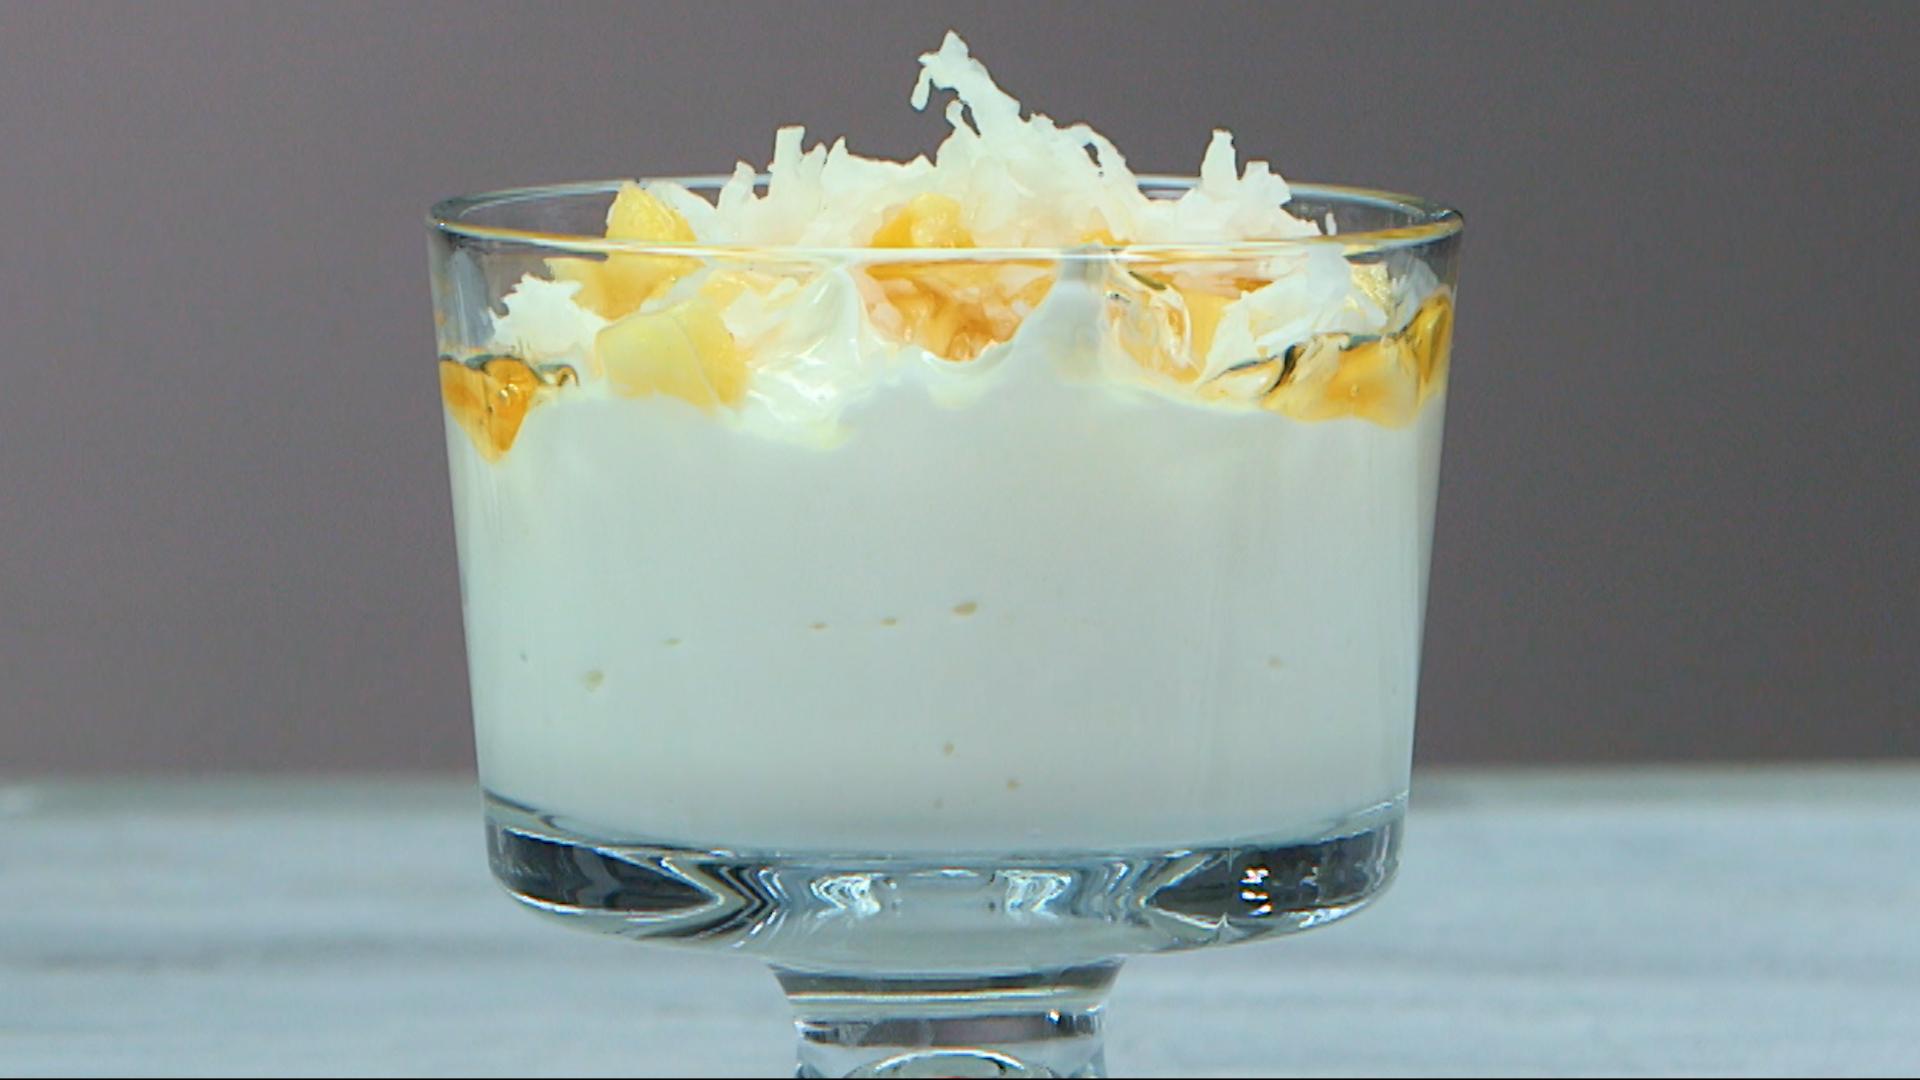 Instant Pot Whole-Milk Yogurt image